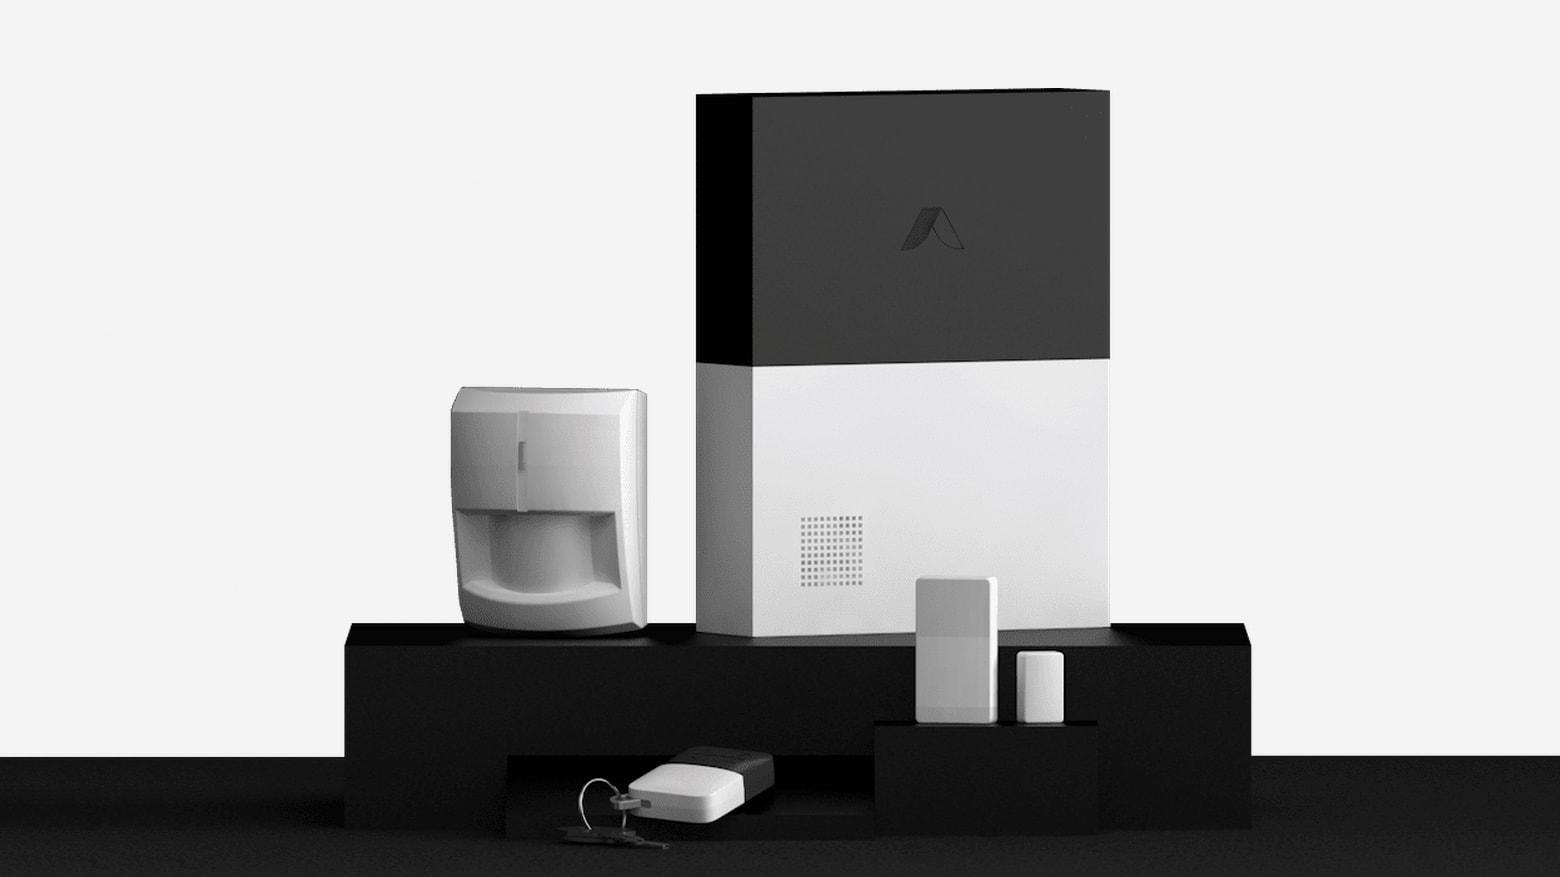 Abode Smart Security Kit gets you started